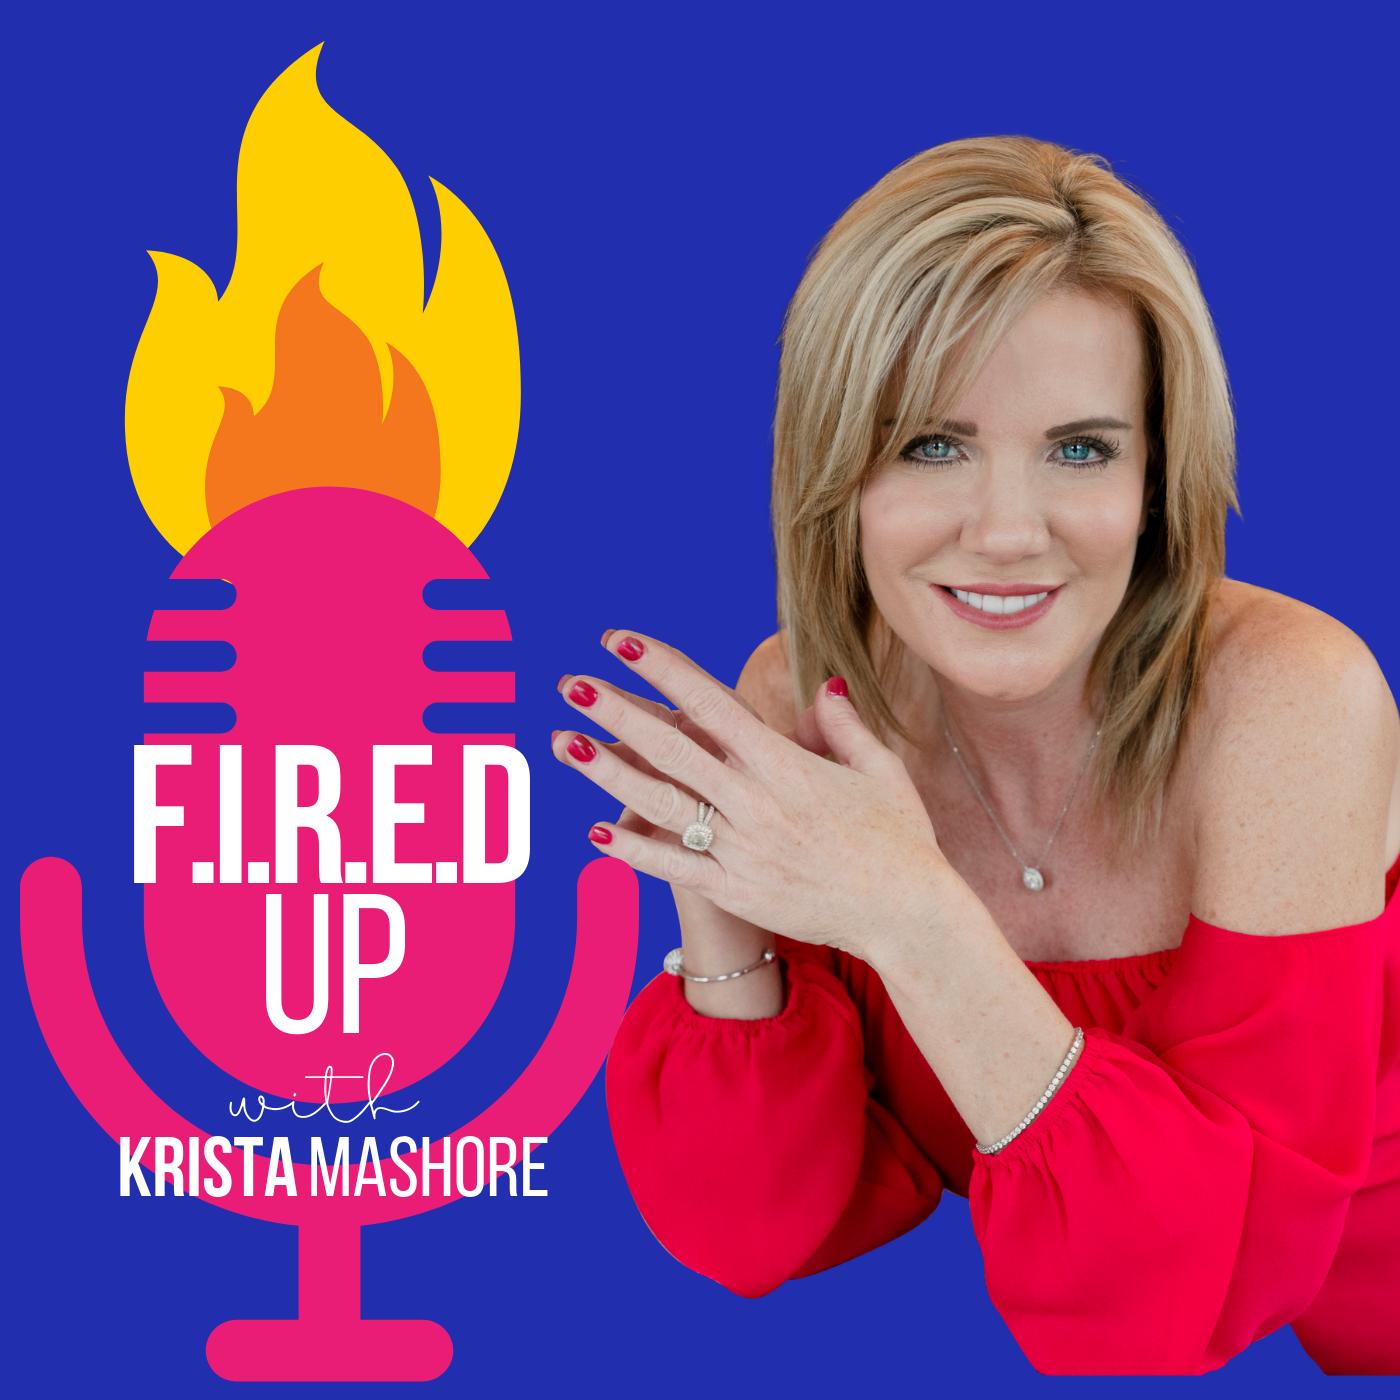 F.I.R.E.D UP with Krista Mashore